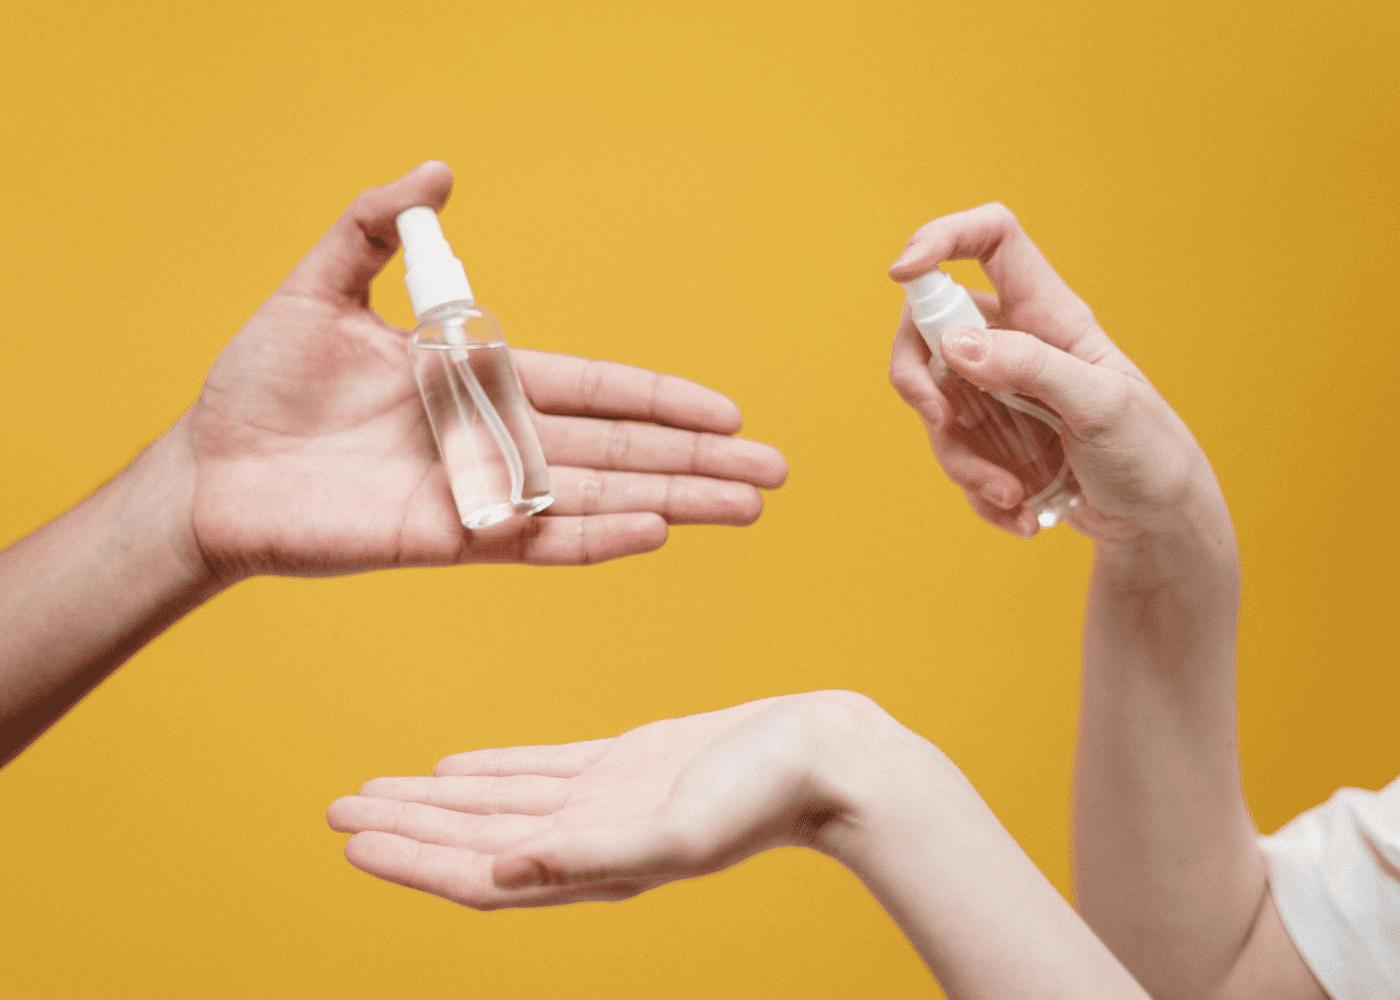 spraying bottle | how to prevent dengue